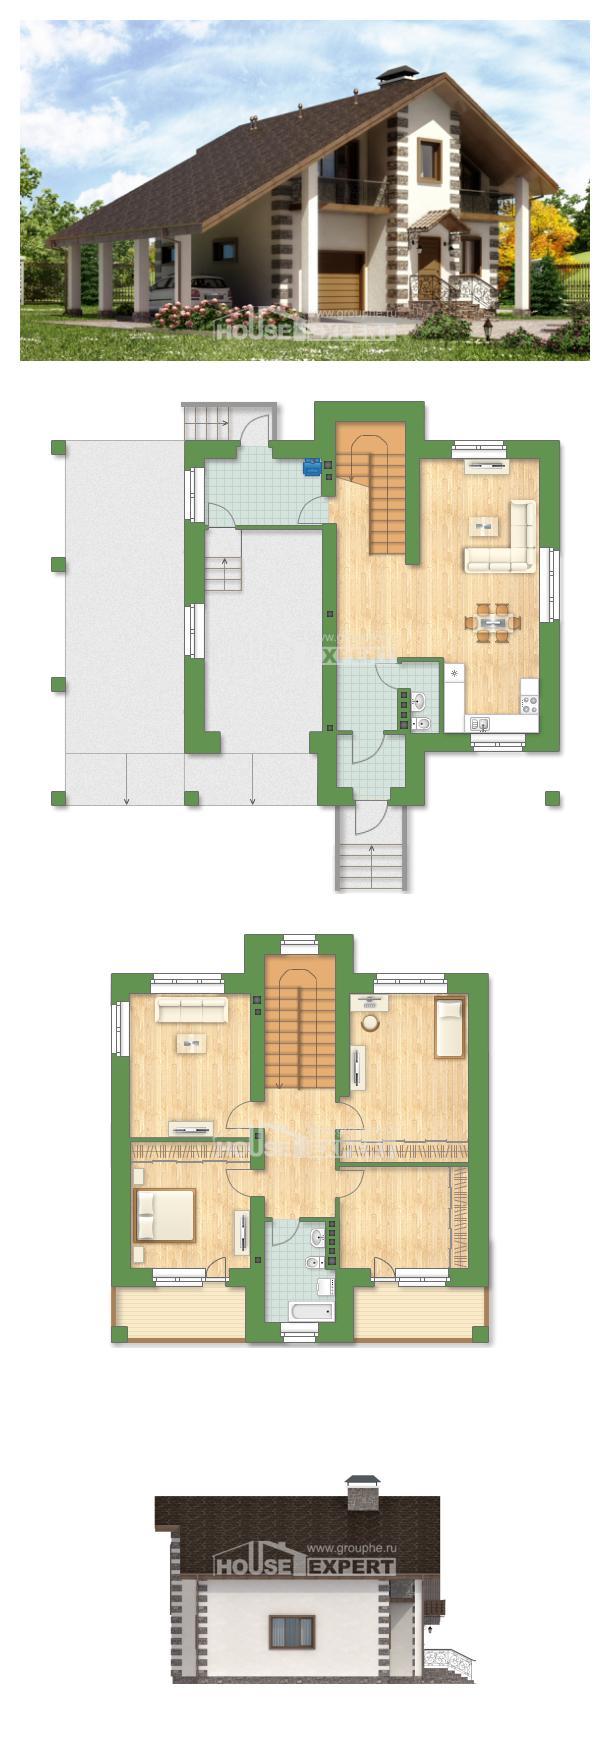 Проект дома 150-003-Л   House Expert